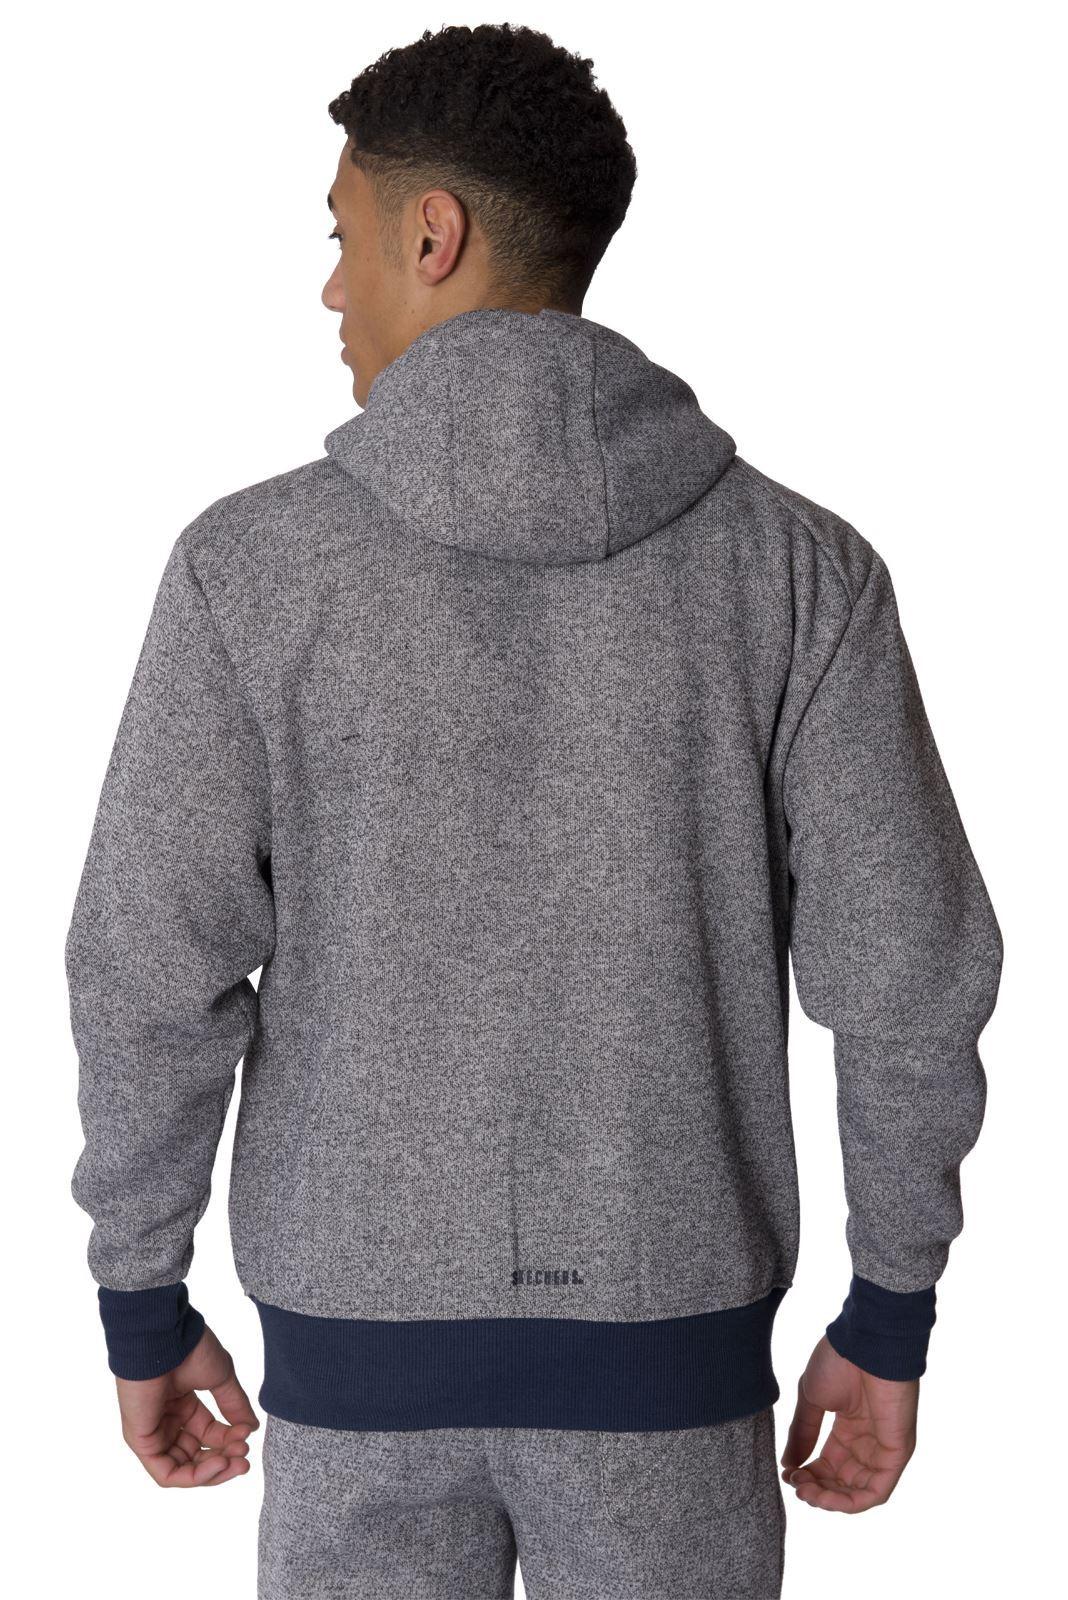 Skechers Mens Sweat Hoodie Casual Zip Up Hoody Coat ...